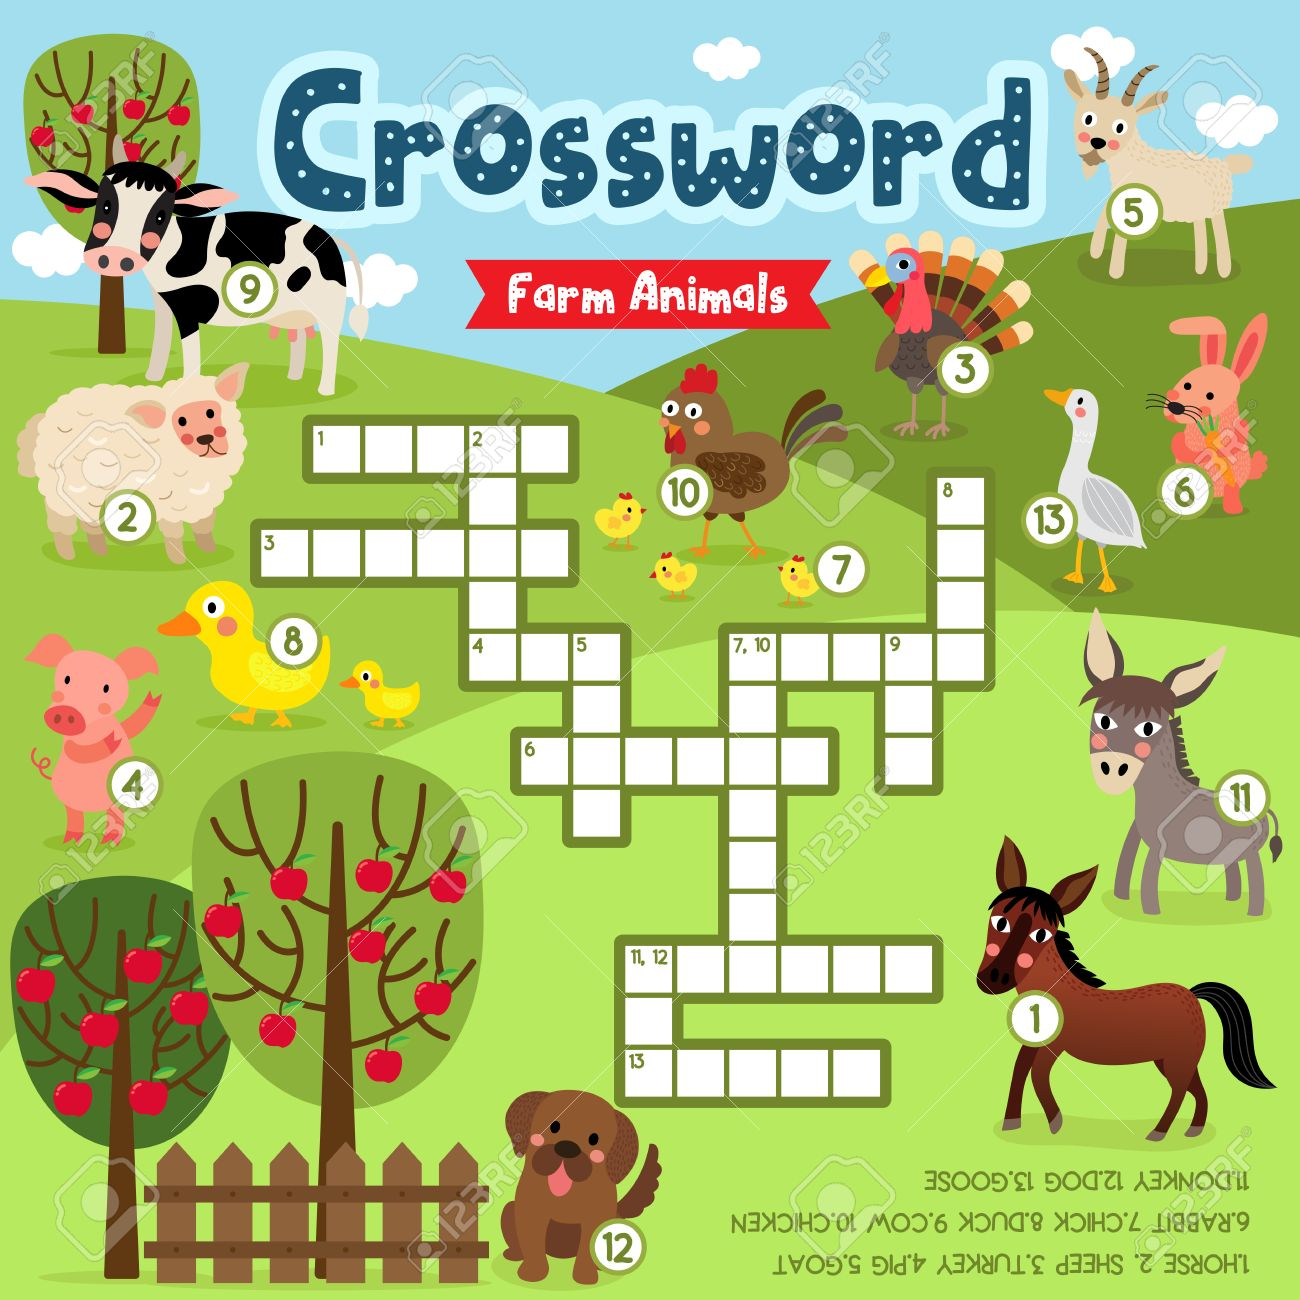 Crosswords Puzzle Game Of Farm Animals For Preschool Kids Activity - Printable Crossword Puzzle Animals